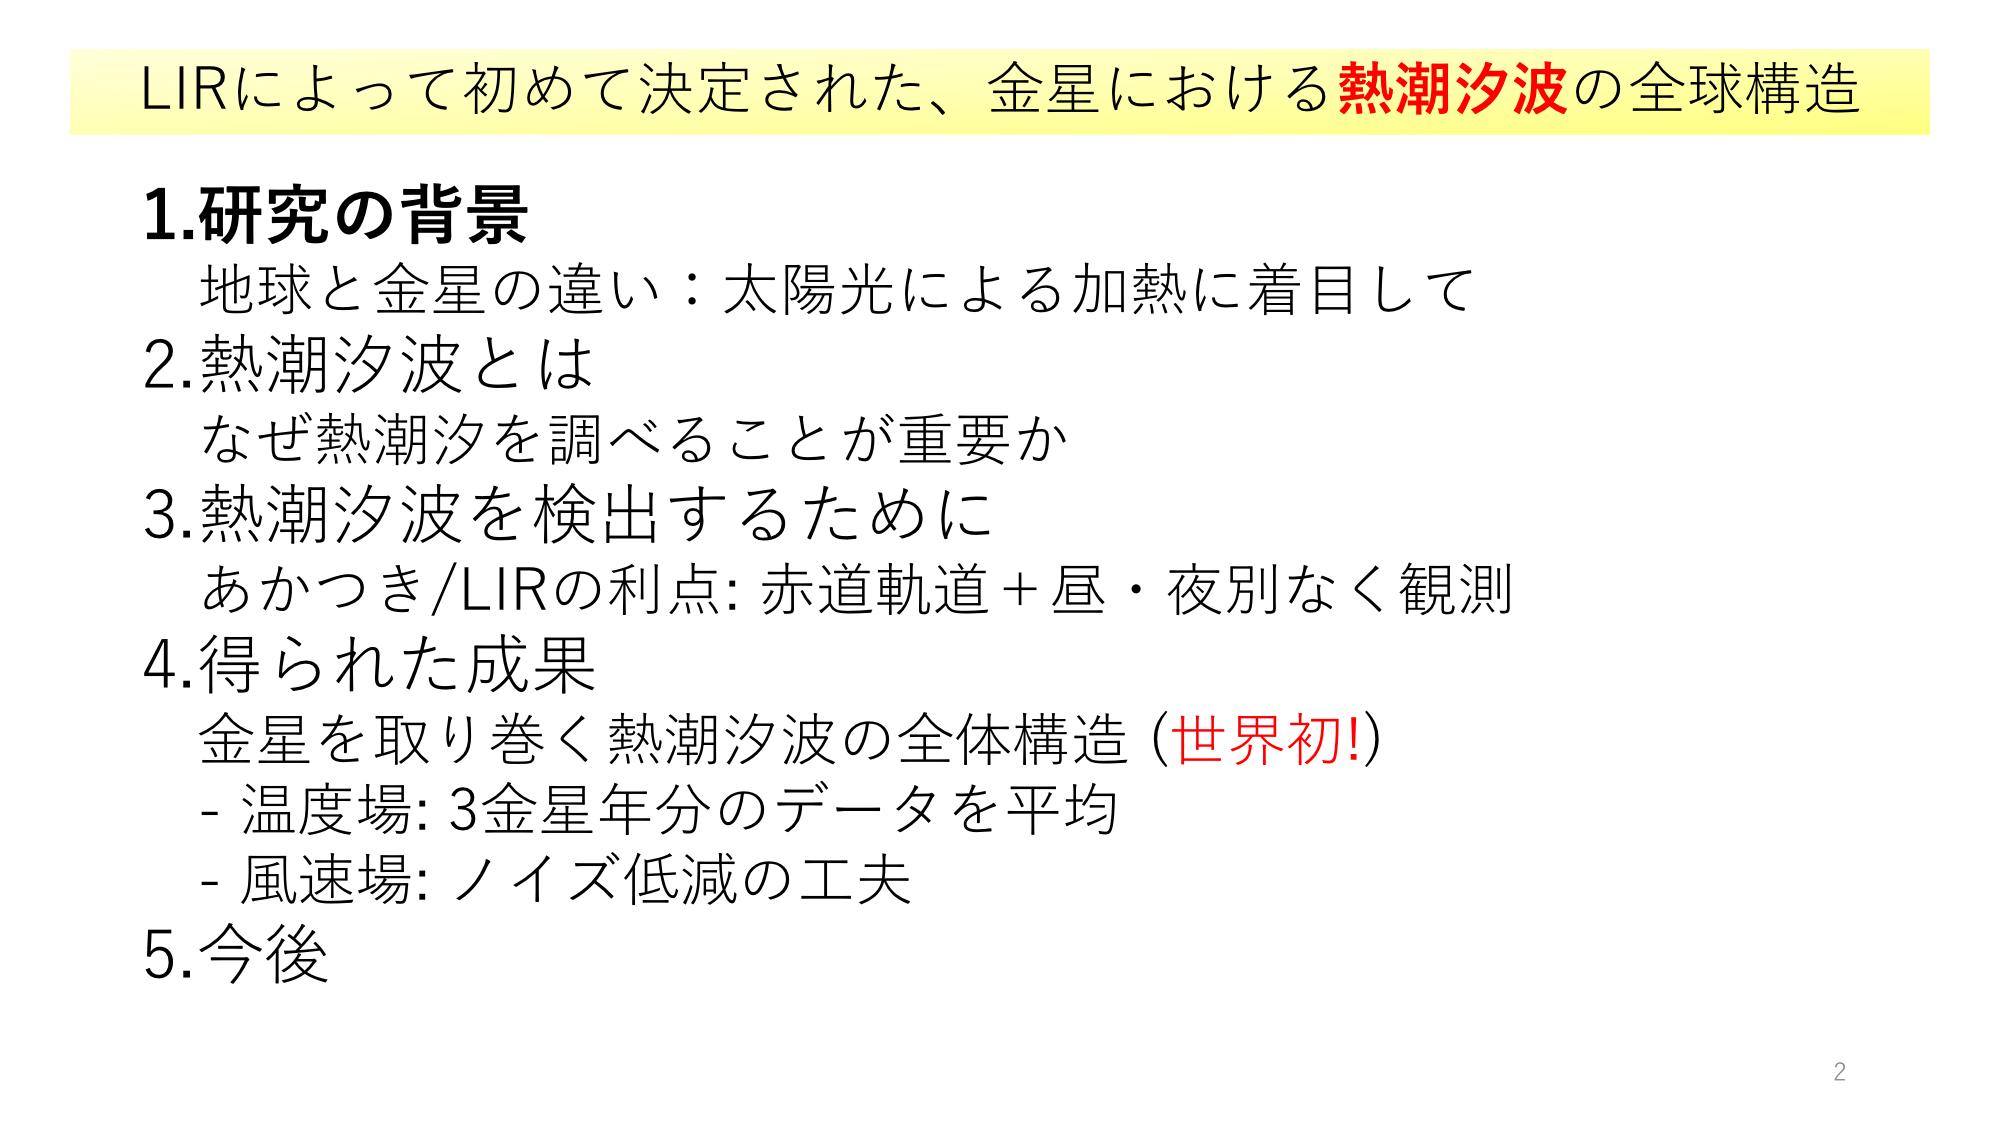 f:id:Imamura:20191119205333p:plain